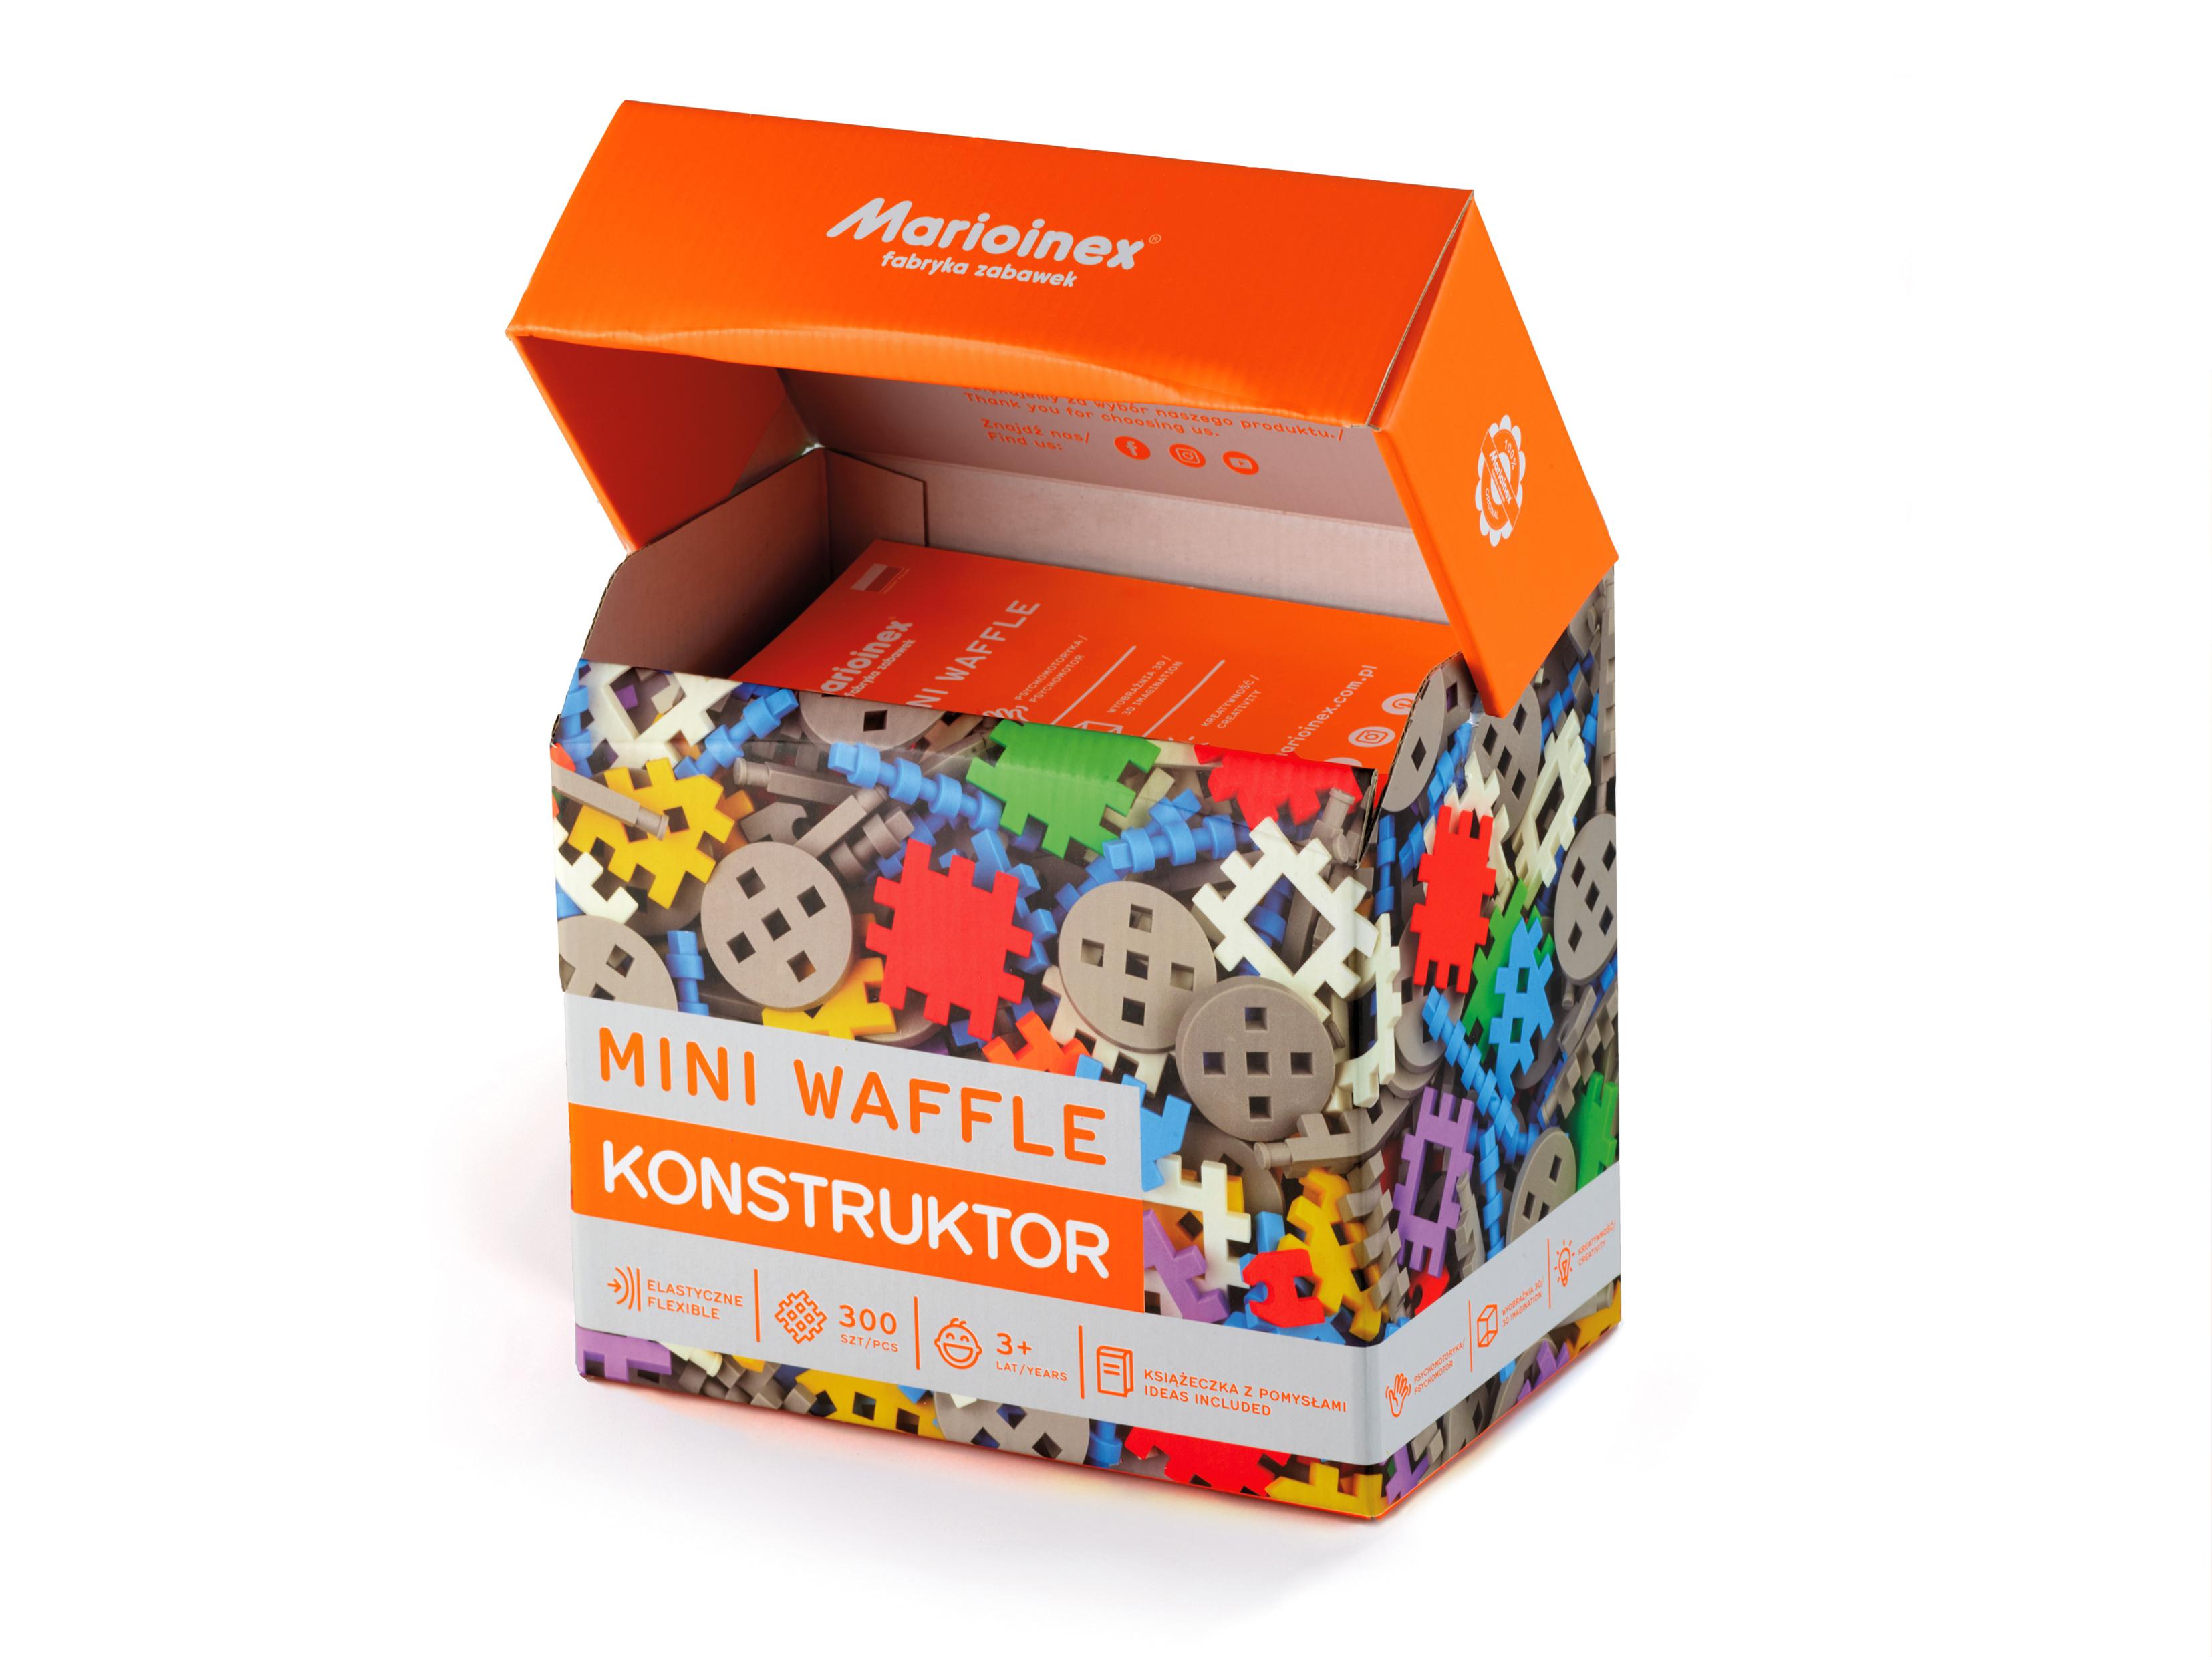 Marioinex MINI WAFLE – 300 ks Konstruktér